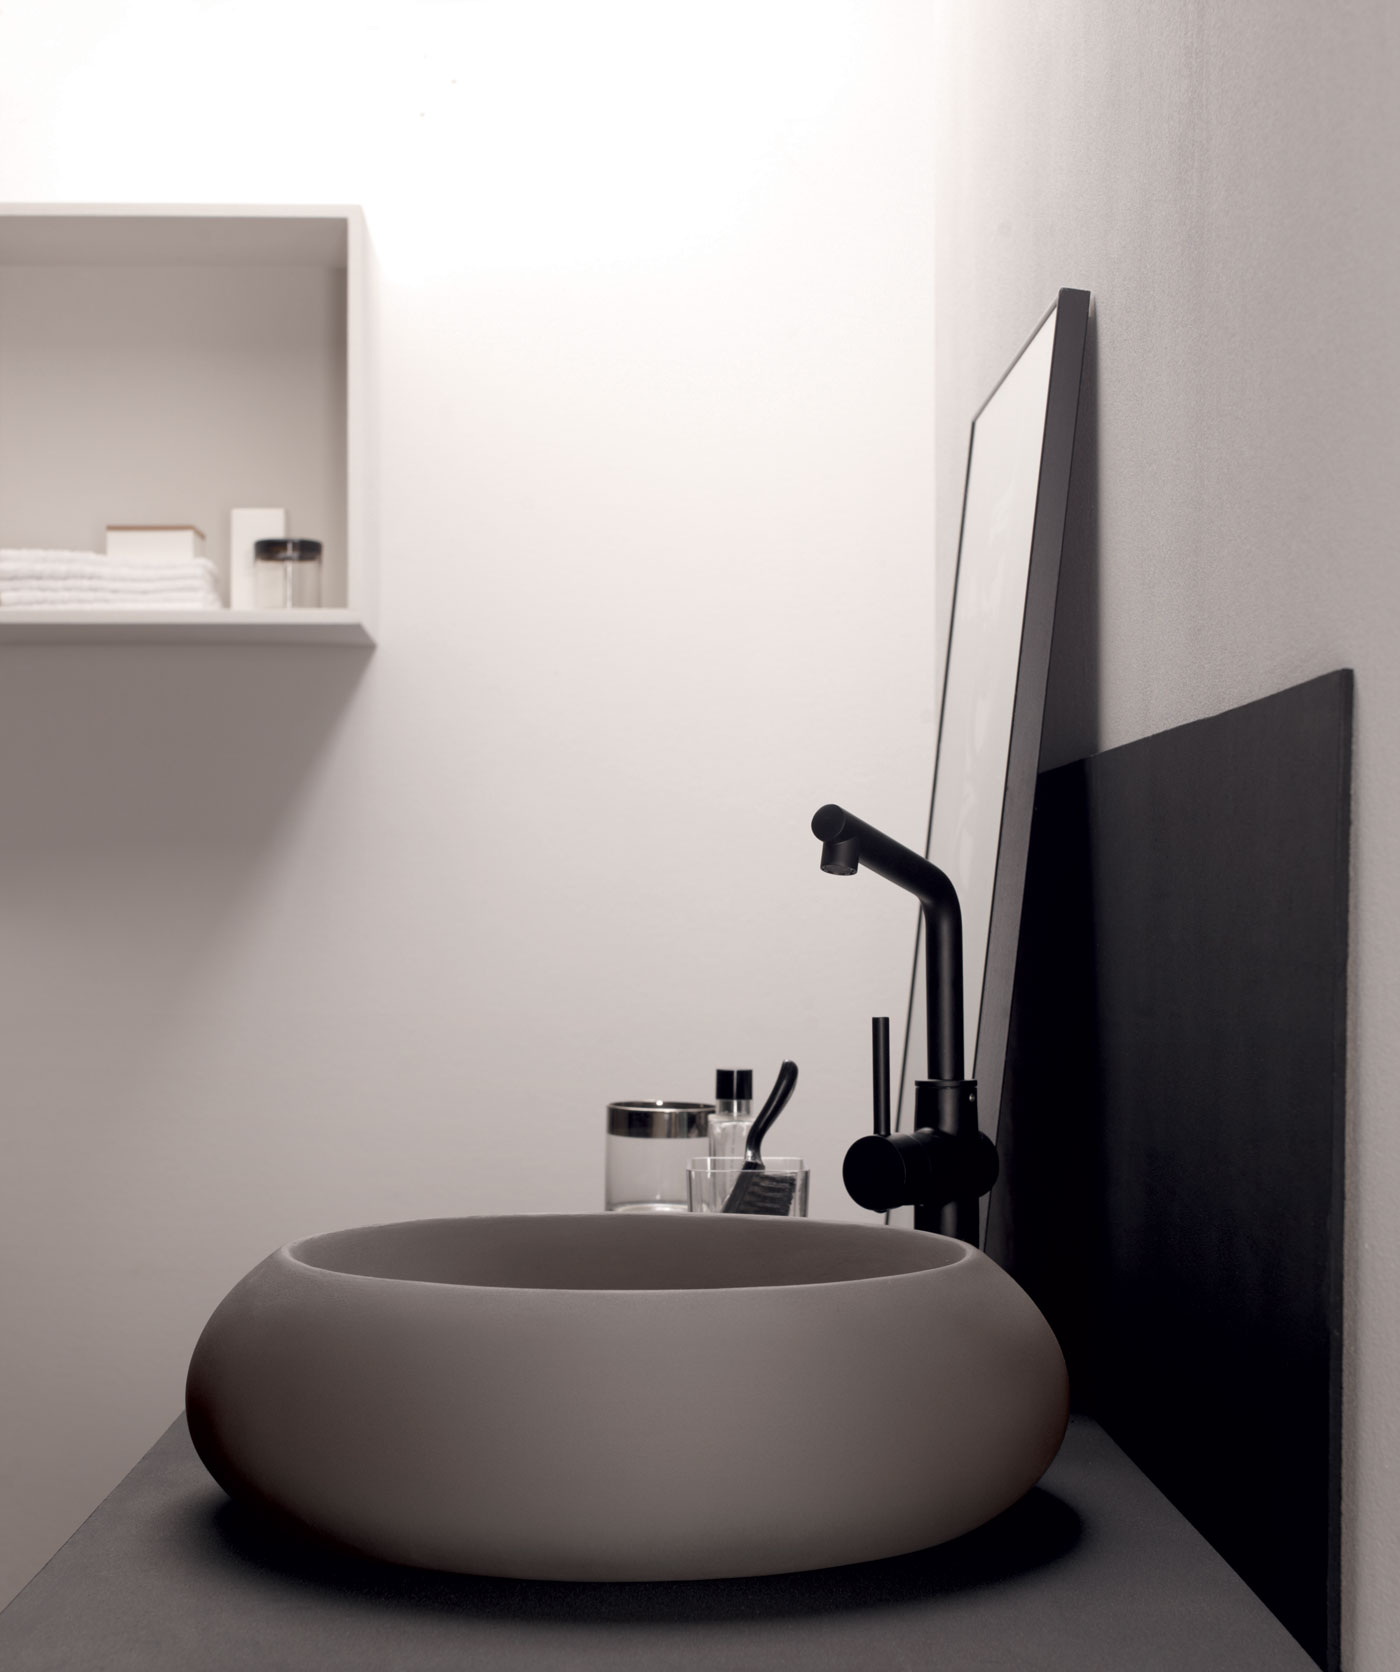 Bathrooms: Sleek Sanctuary